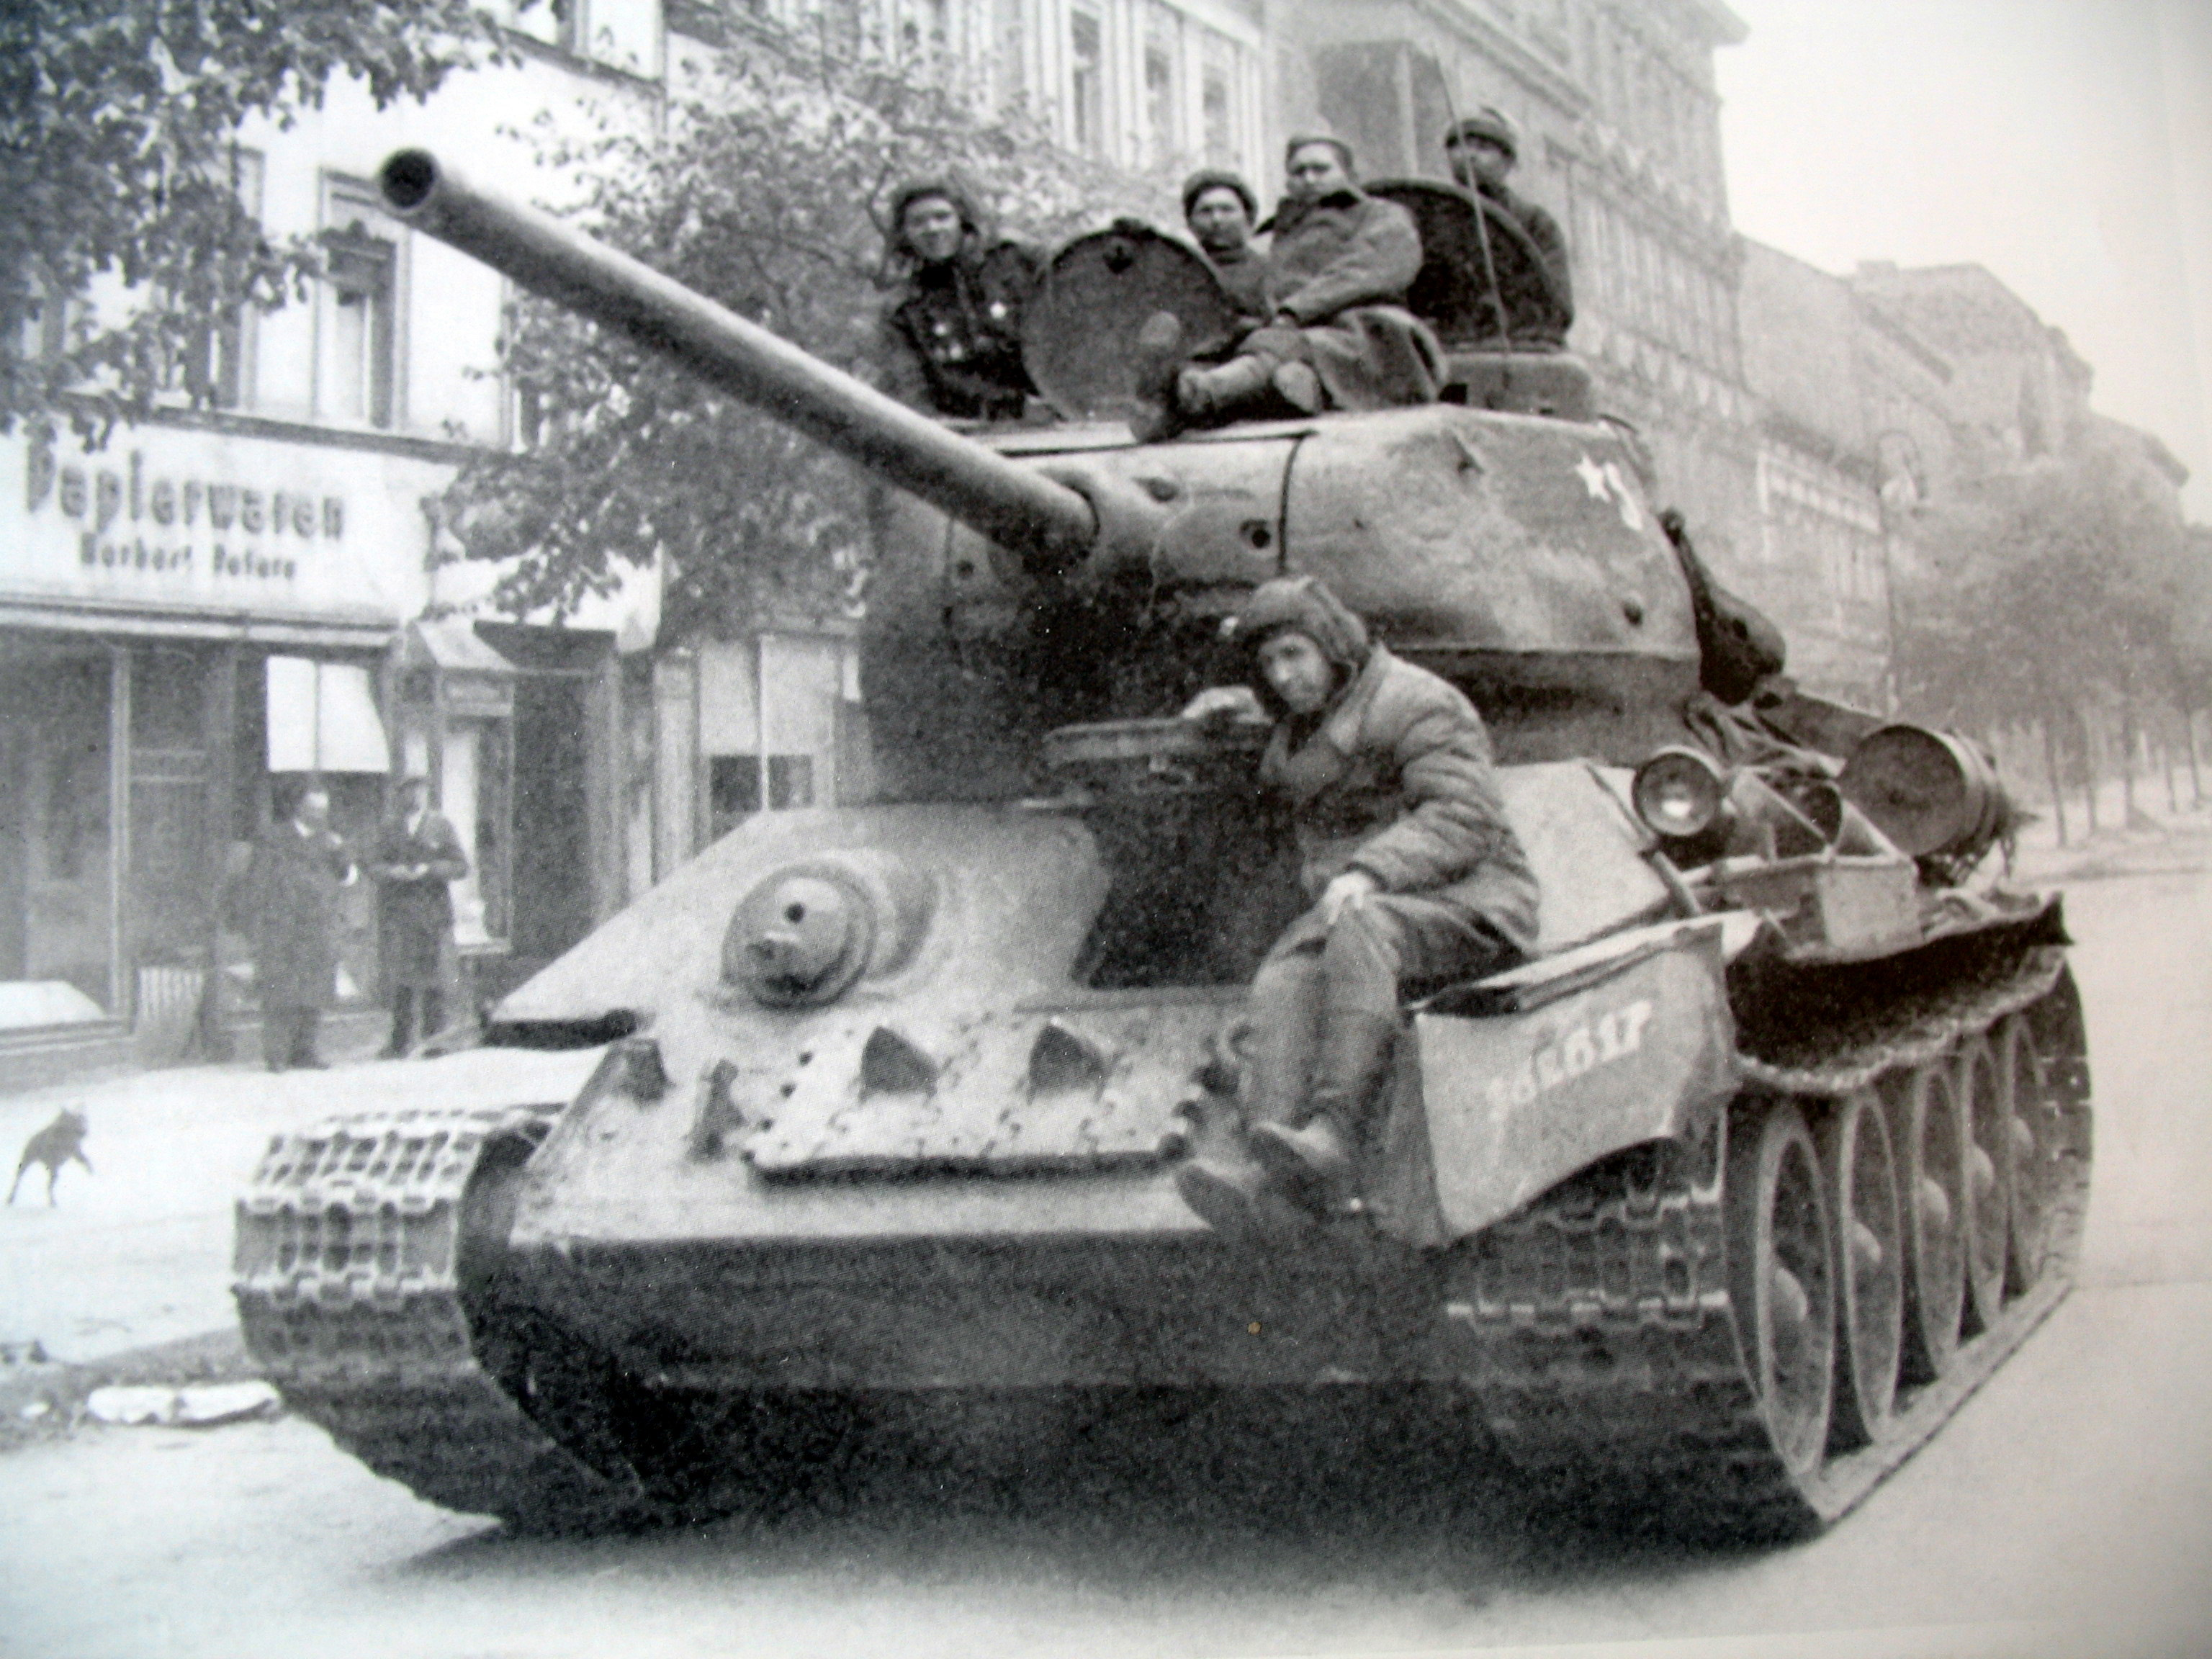 10 рекордов танка Т-34 - Армейский сайт «Почта полевая»